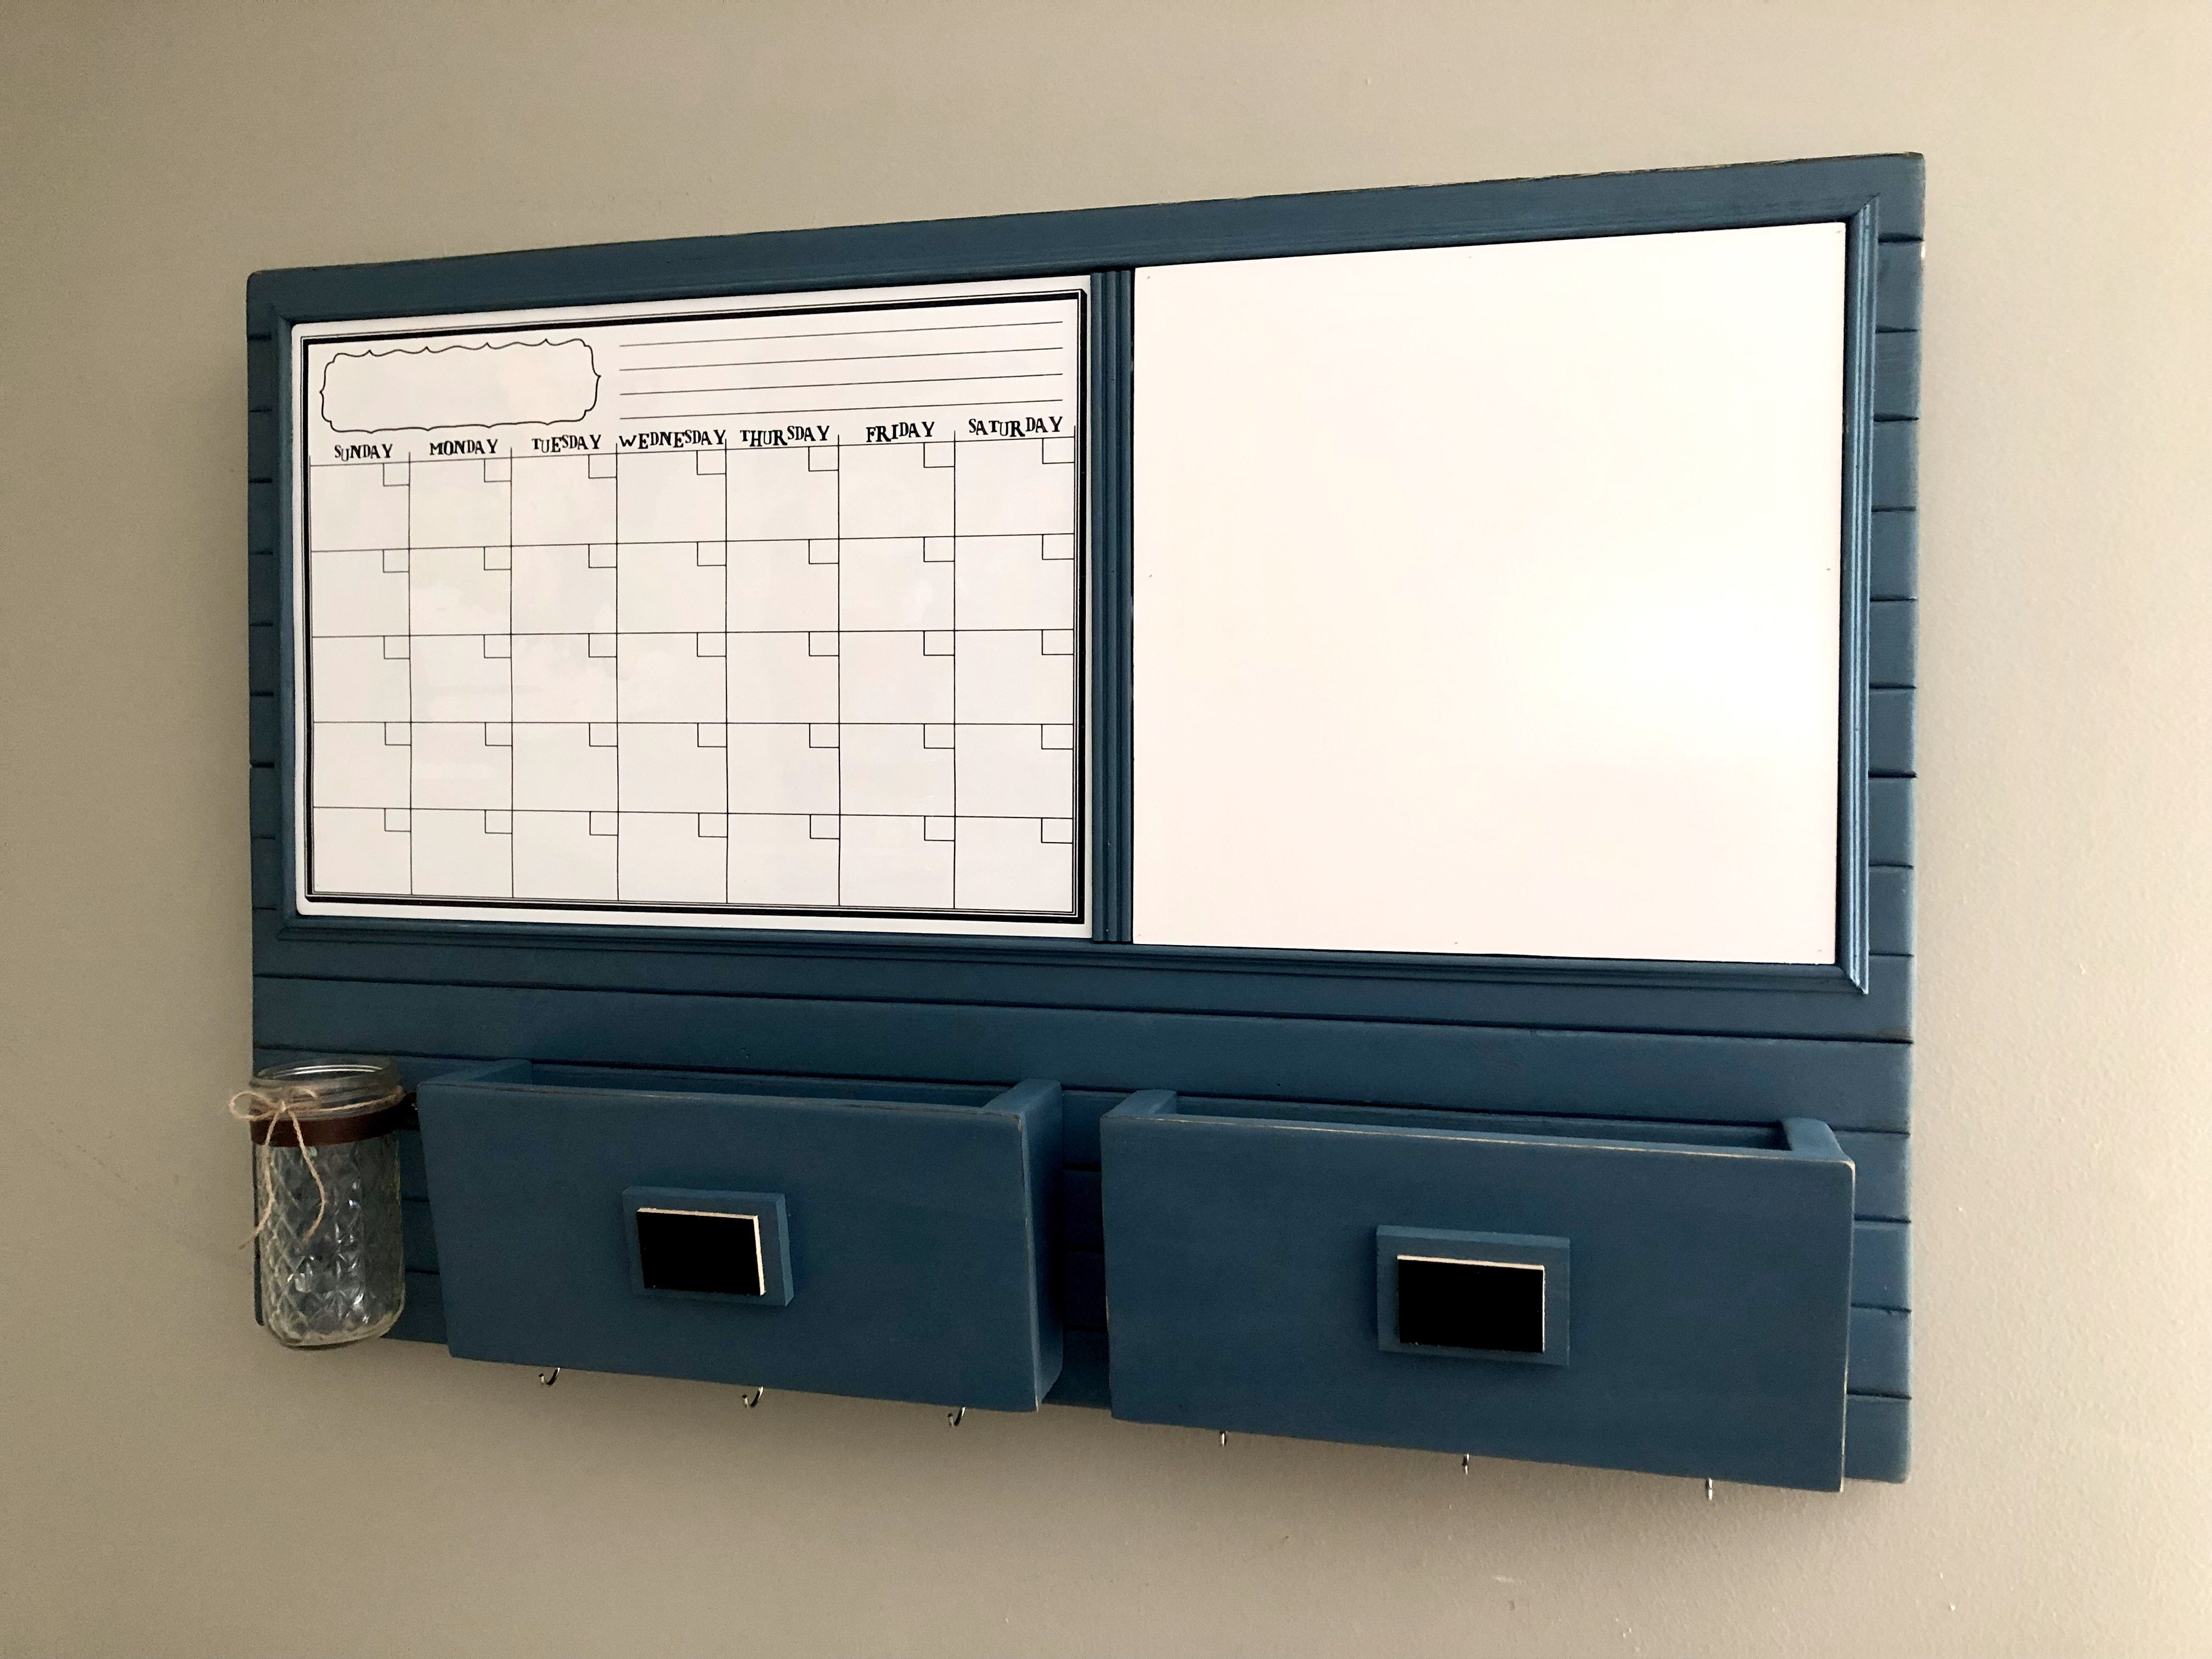 Harmony Boards Wall Organizer with Calendar, Whiteboard, Mail Sorter and Key Hooks in hazy blue